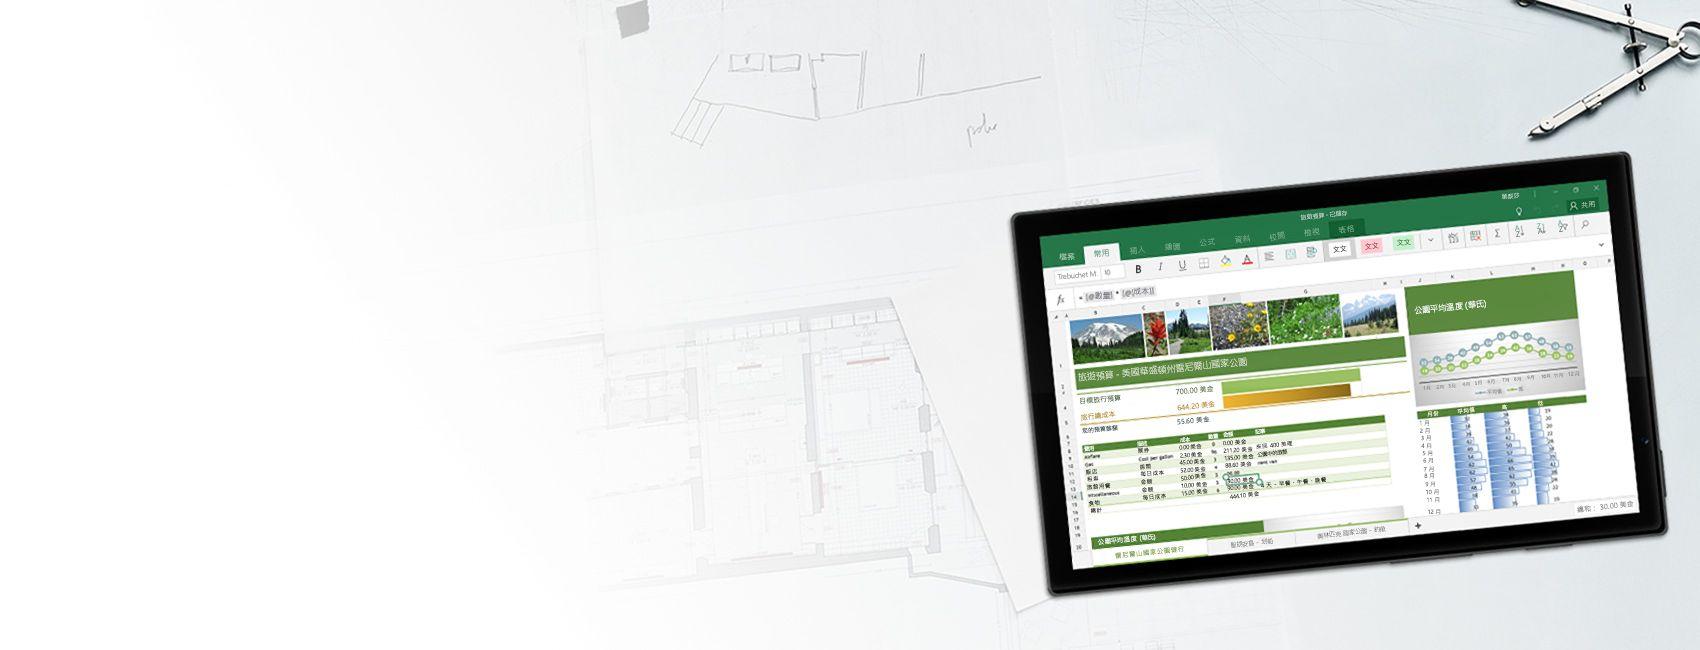 Windows 平板電腦顯示 Windows 10 行動裝置版 Excel 中有一份 Excel 試算表,內容是一張範例圖表以及一份旅遊預算表